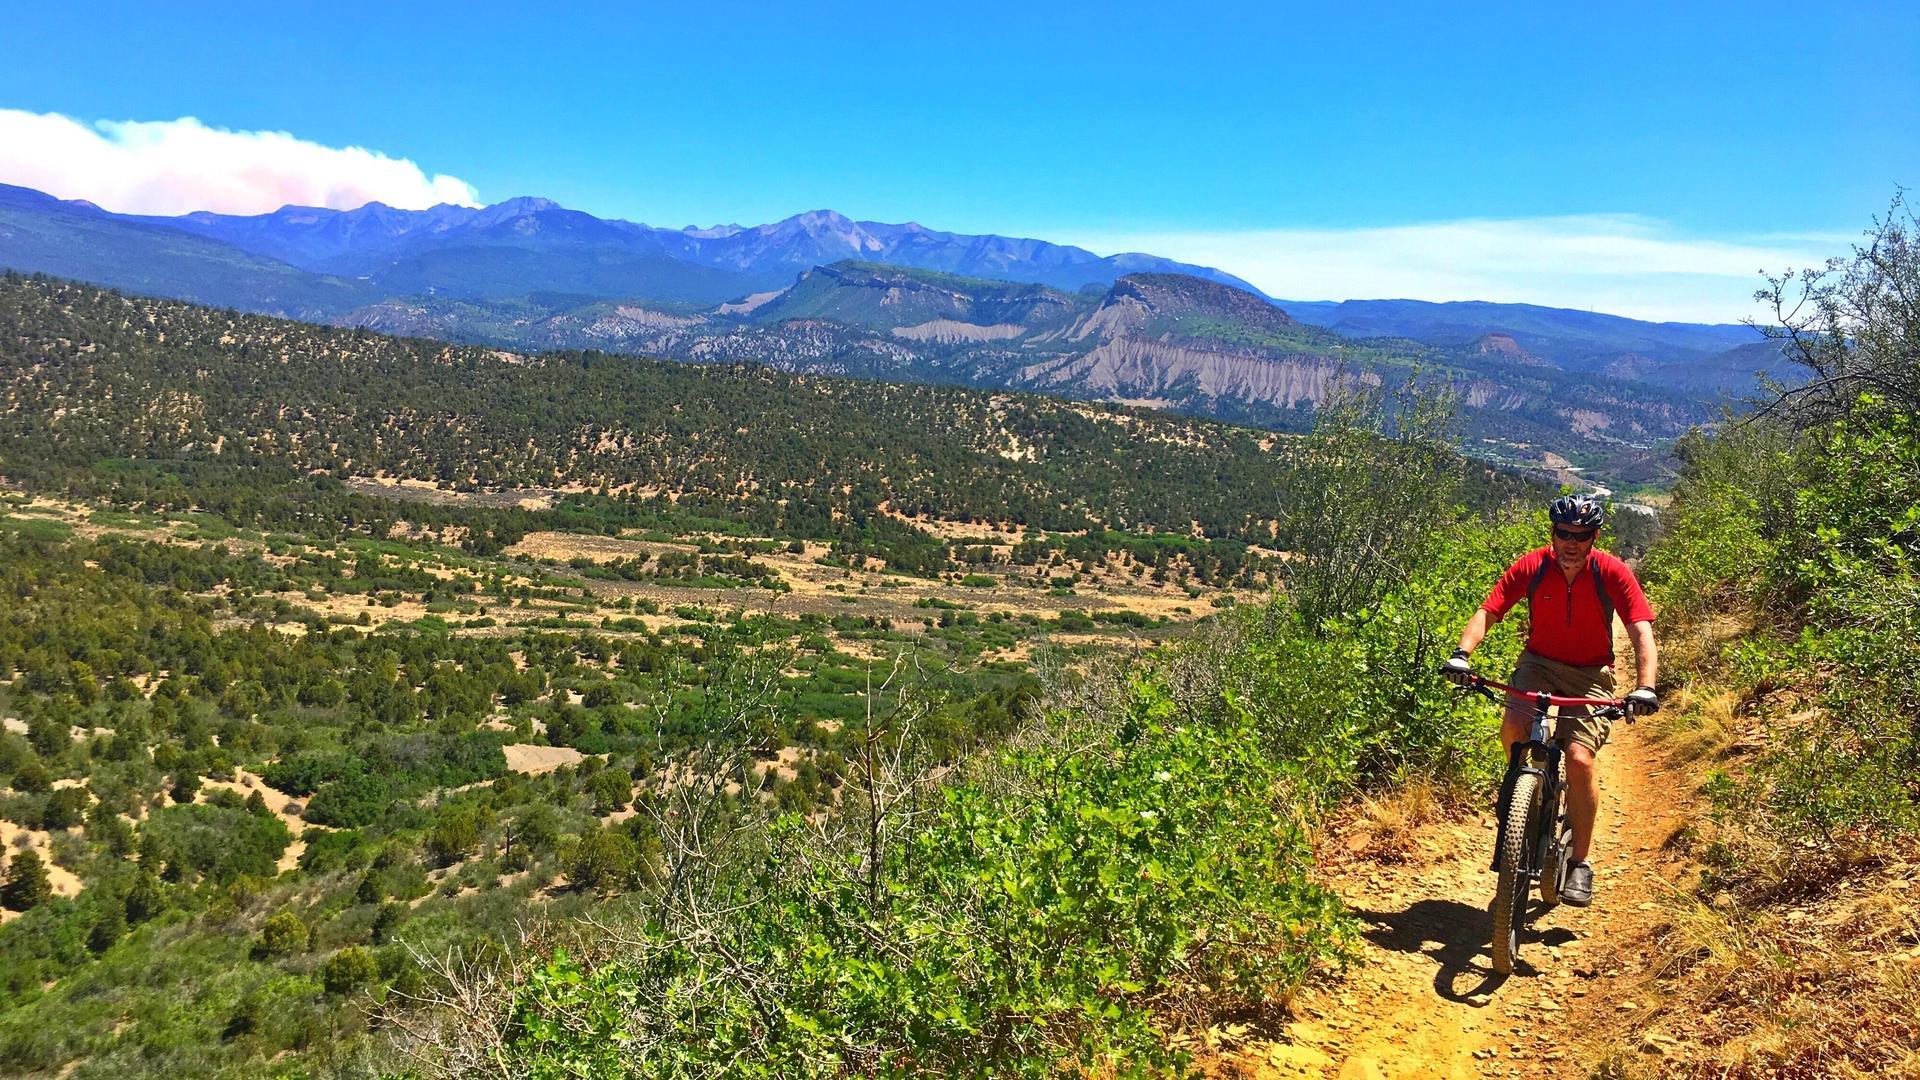 Mr. Plemons mountain biking in Durango, Colorado